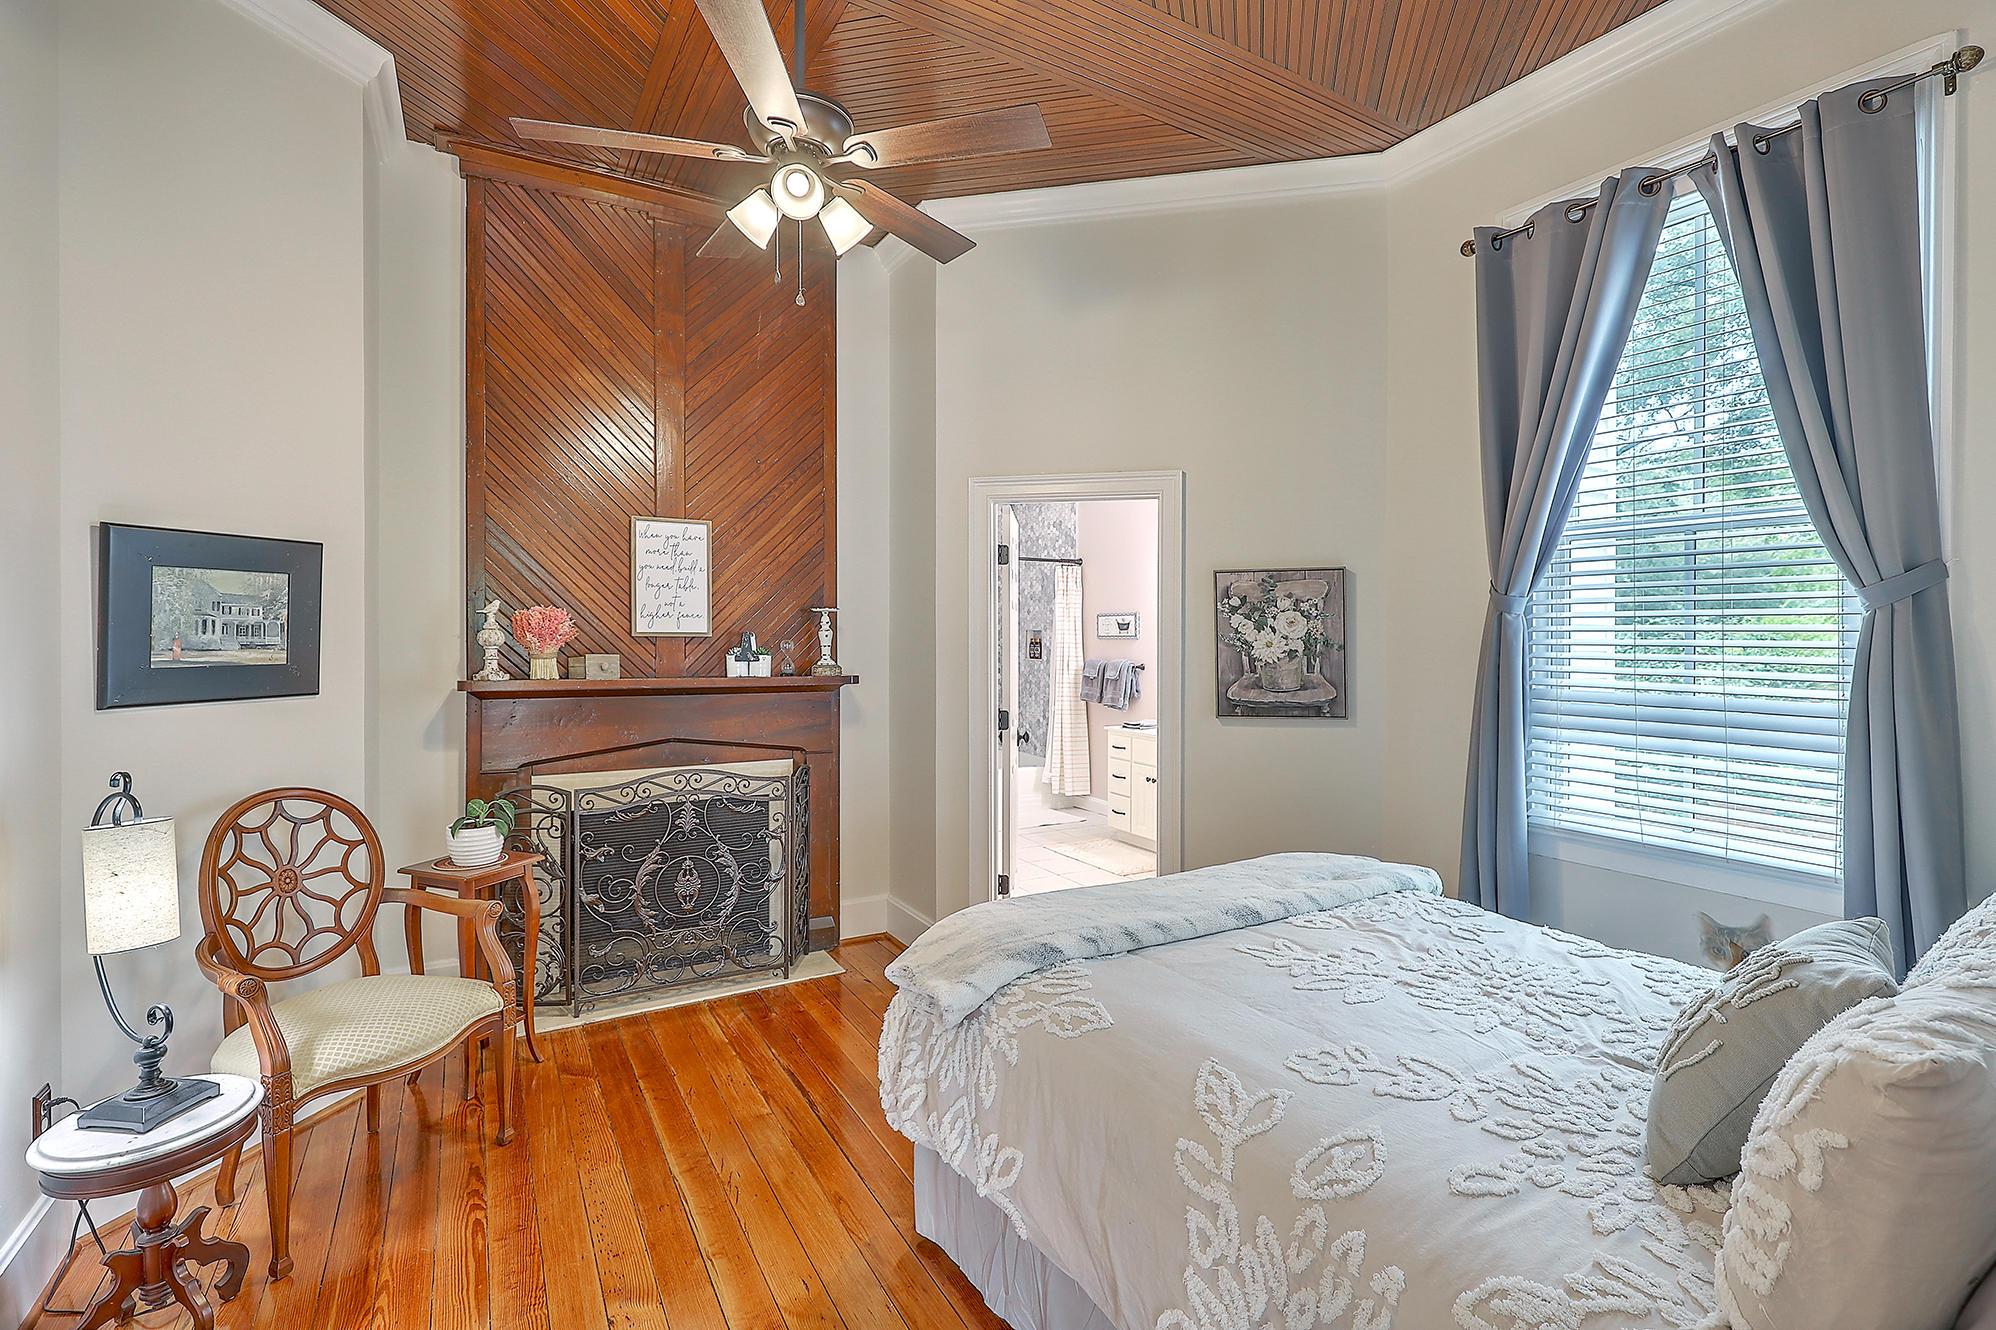 Summerville Homes For Sale - 102 Hickory, Summerville, SC - 25